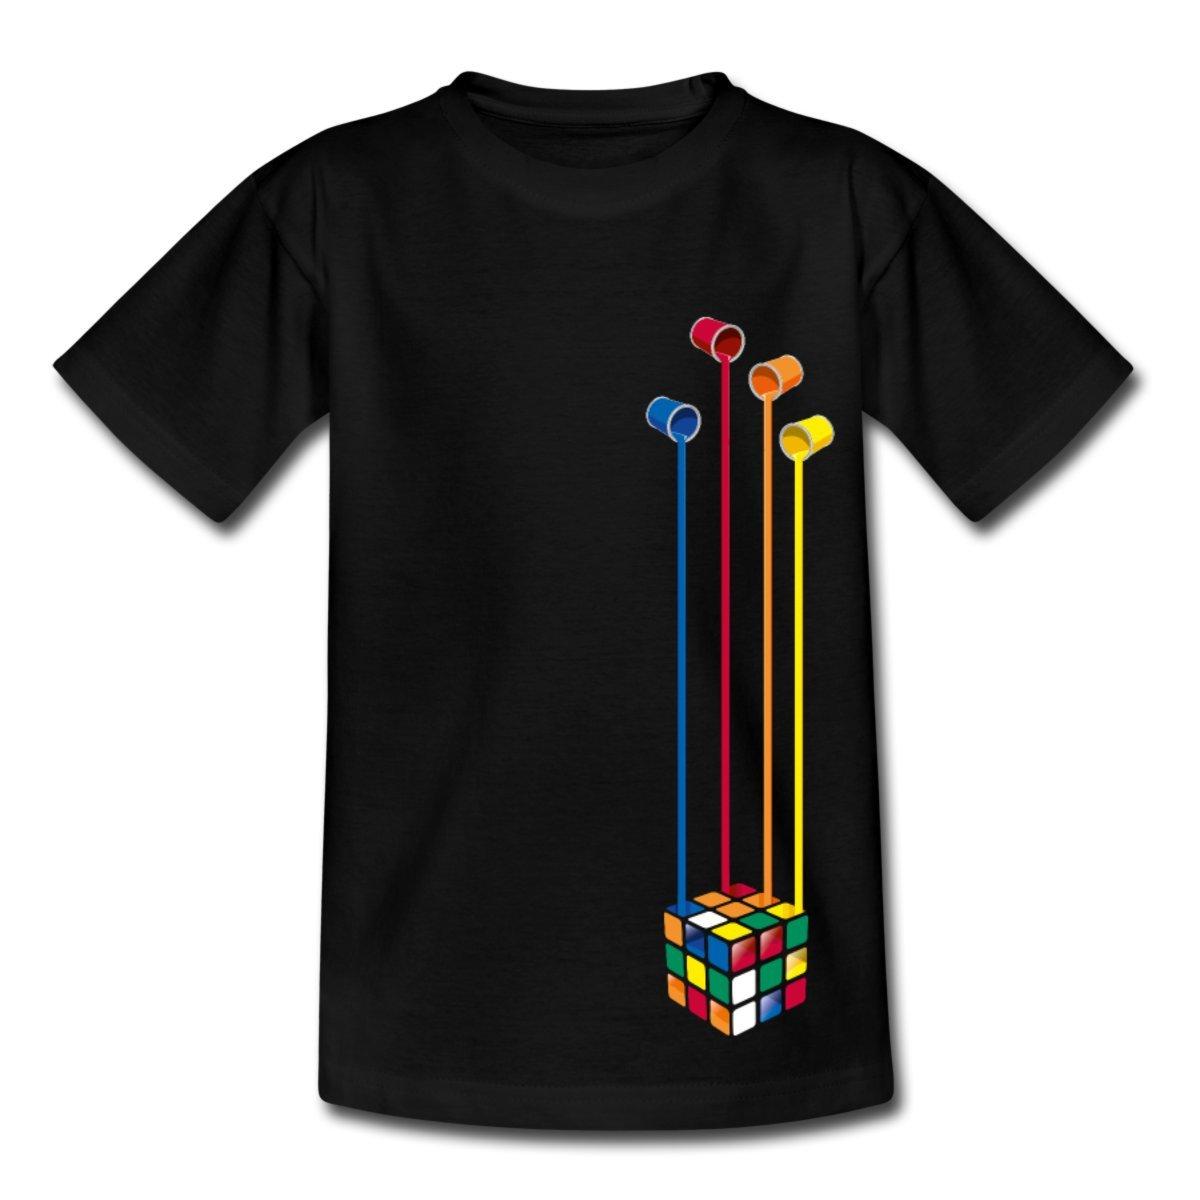 Spreadshirt Rubik's Cube Colourful Paint Buckets Teenage T-Shirt S205909-A108761292-1